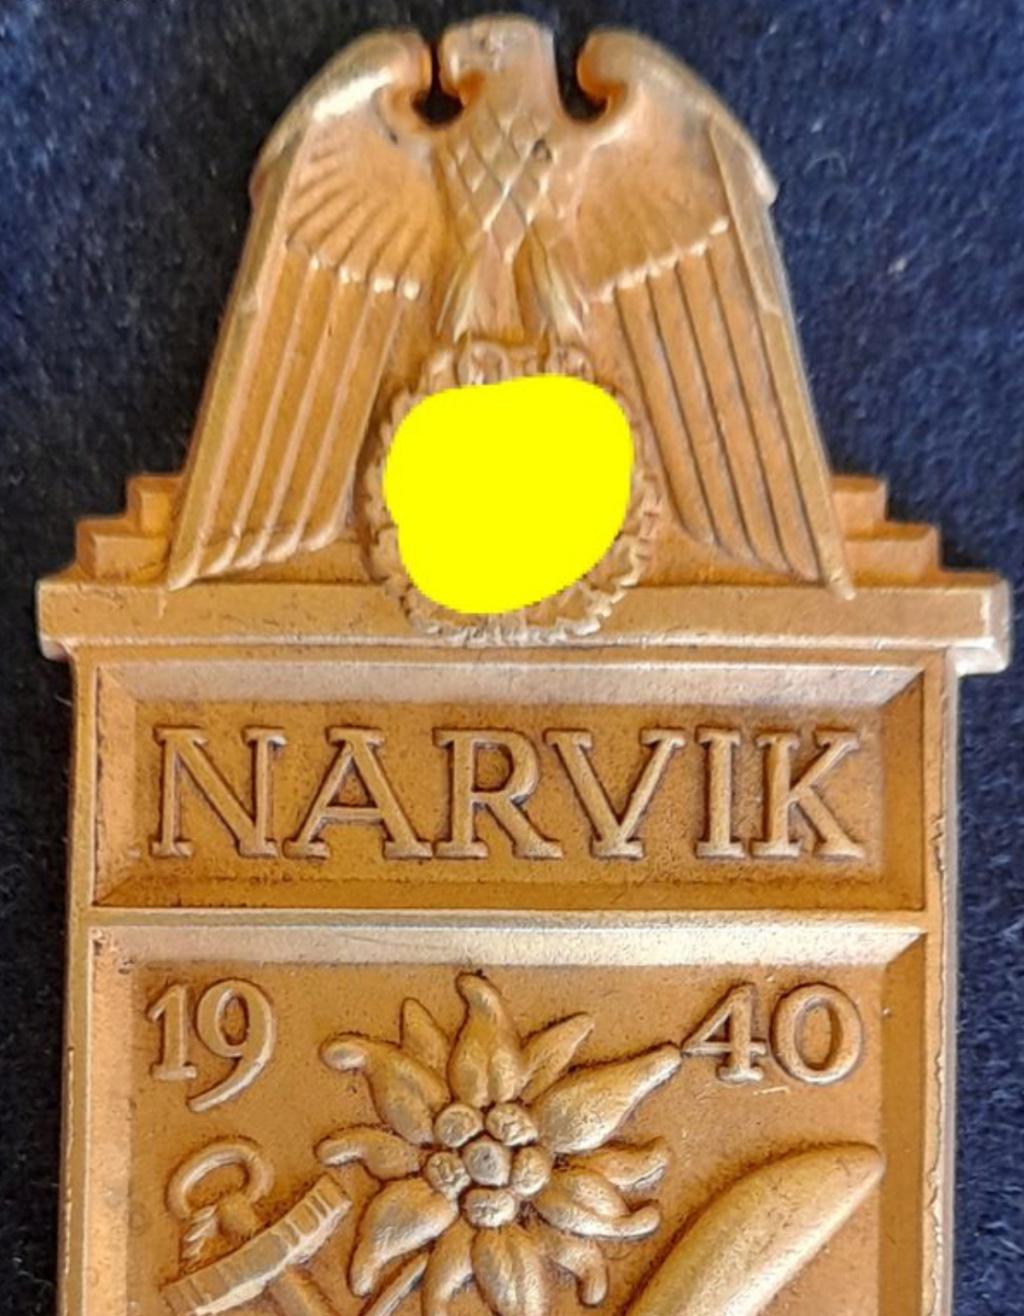 Authentification plaque Narvik WW2 0a578310